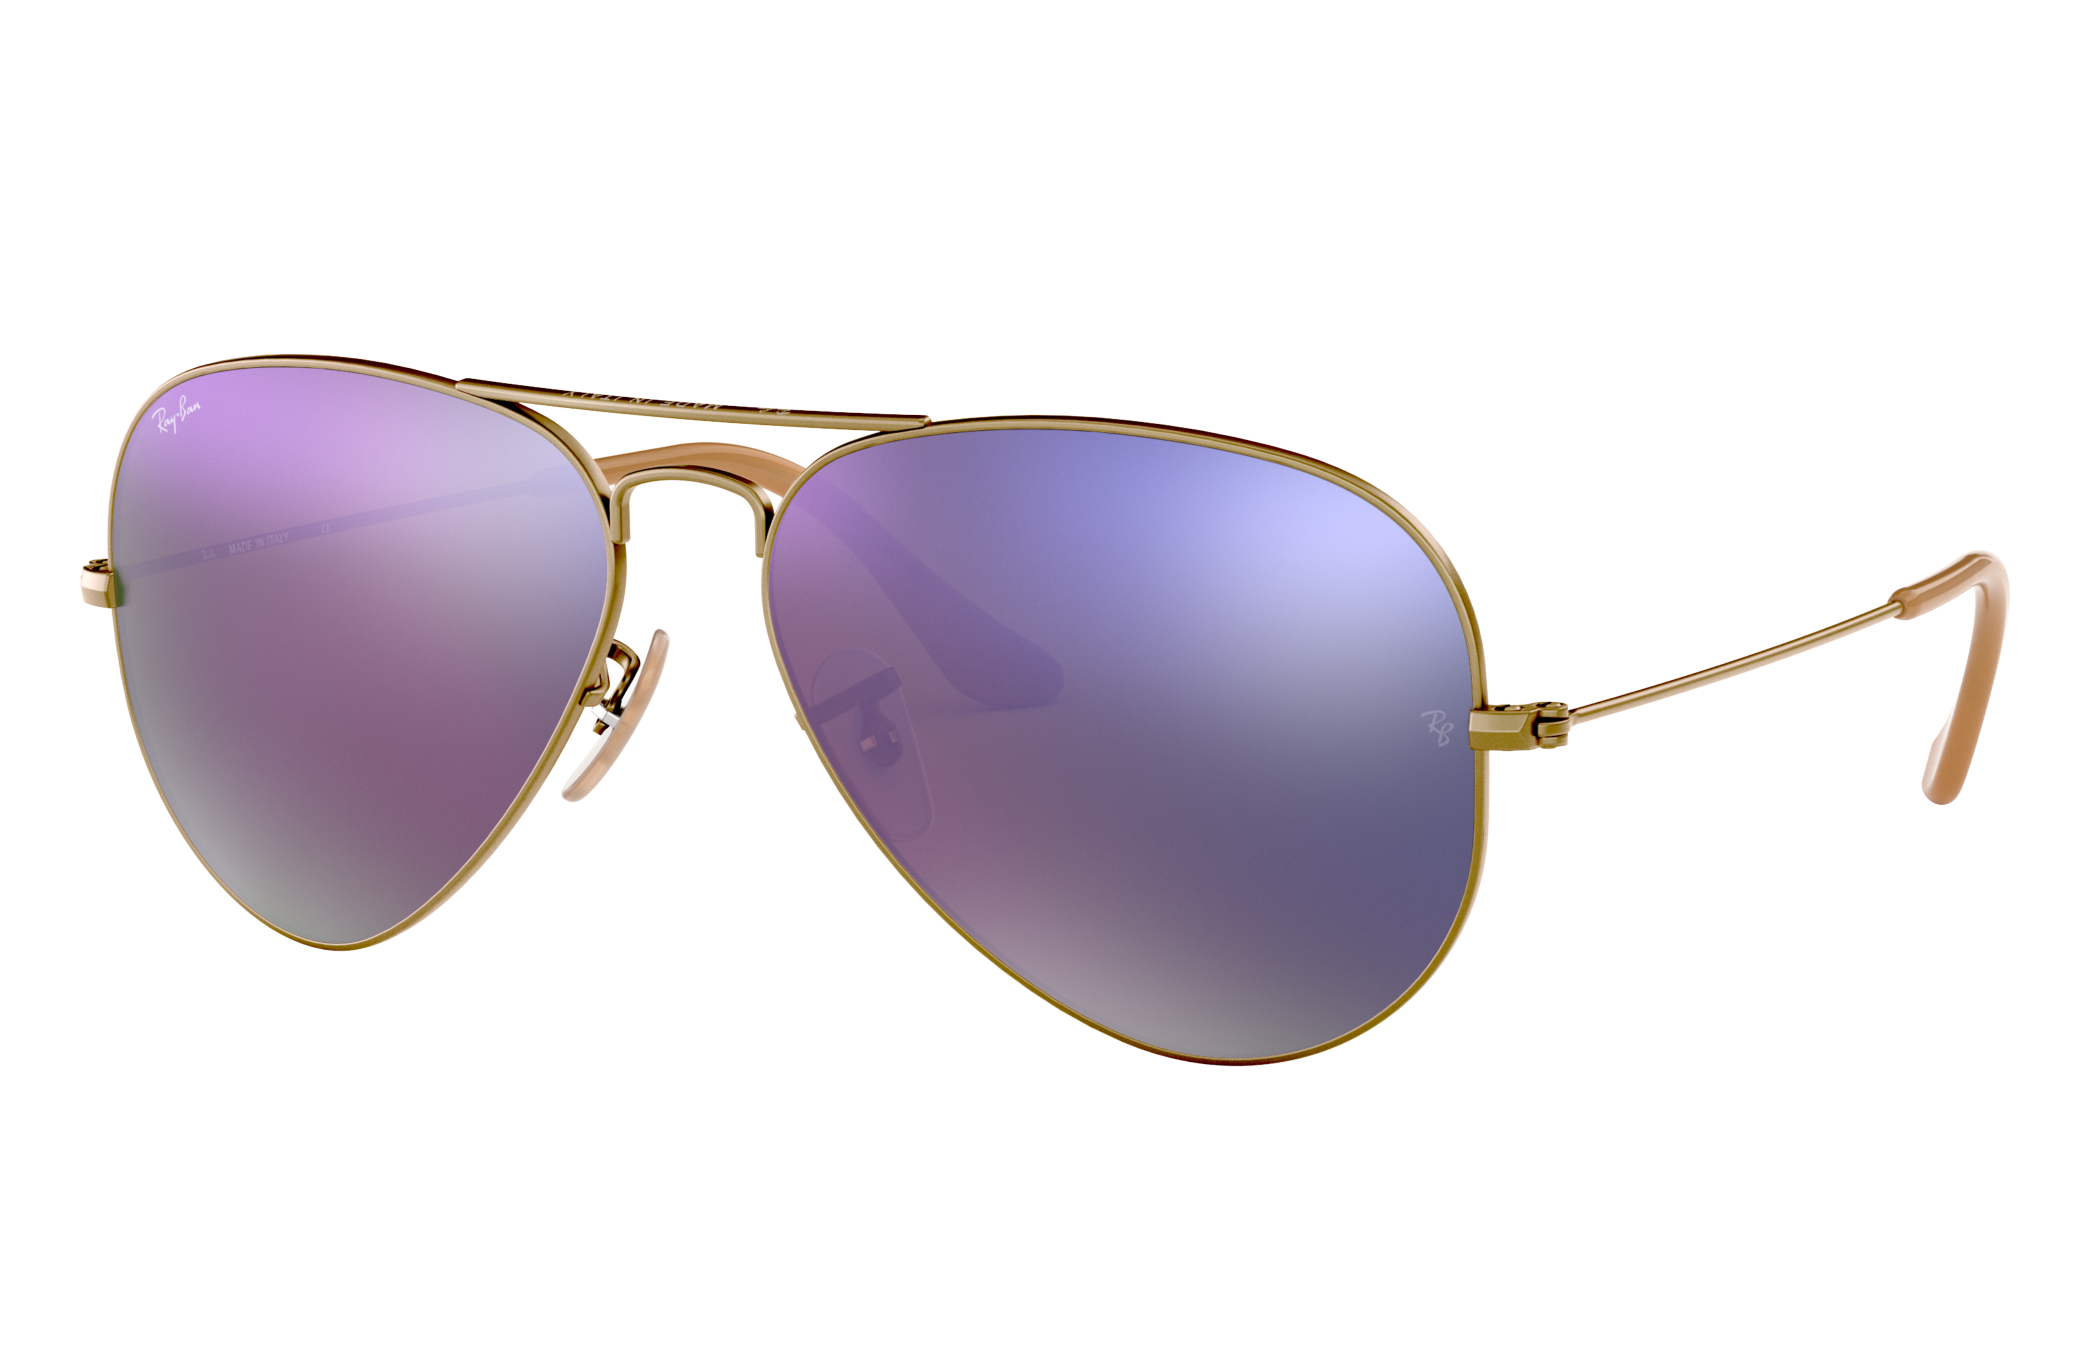 Ray-Ban Aviator Flash Lenses Bronze-Copper, Violet Lenses - RB3025